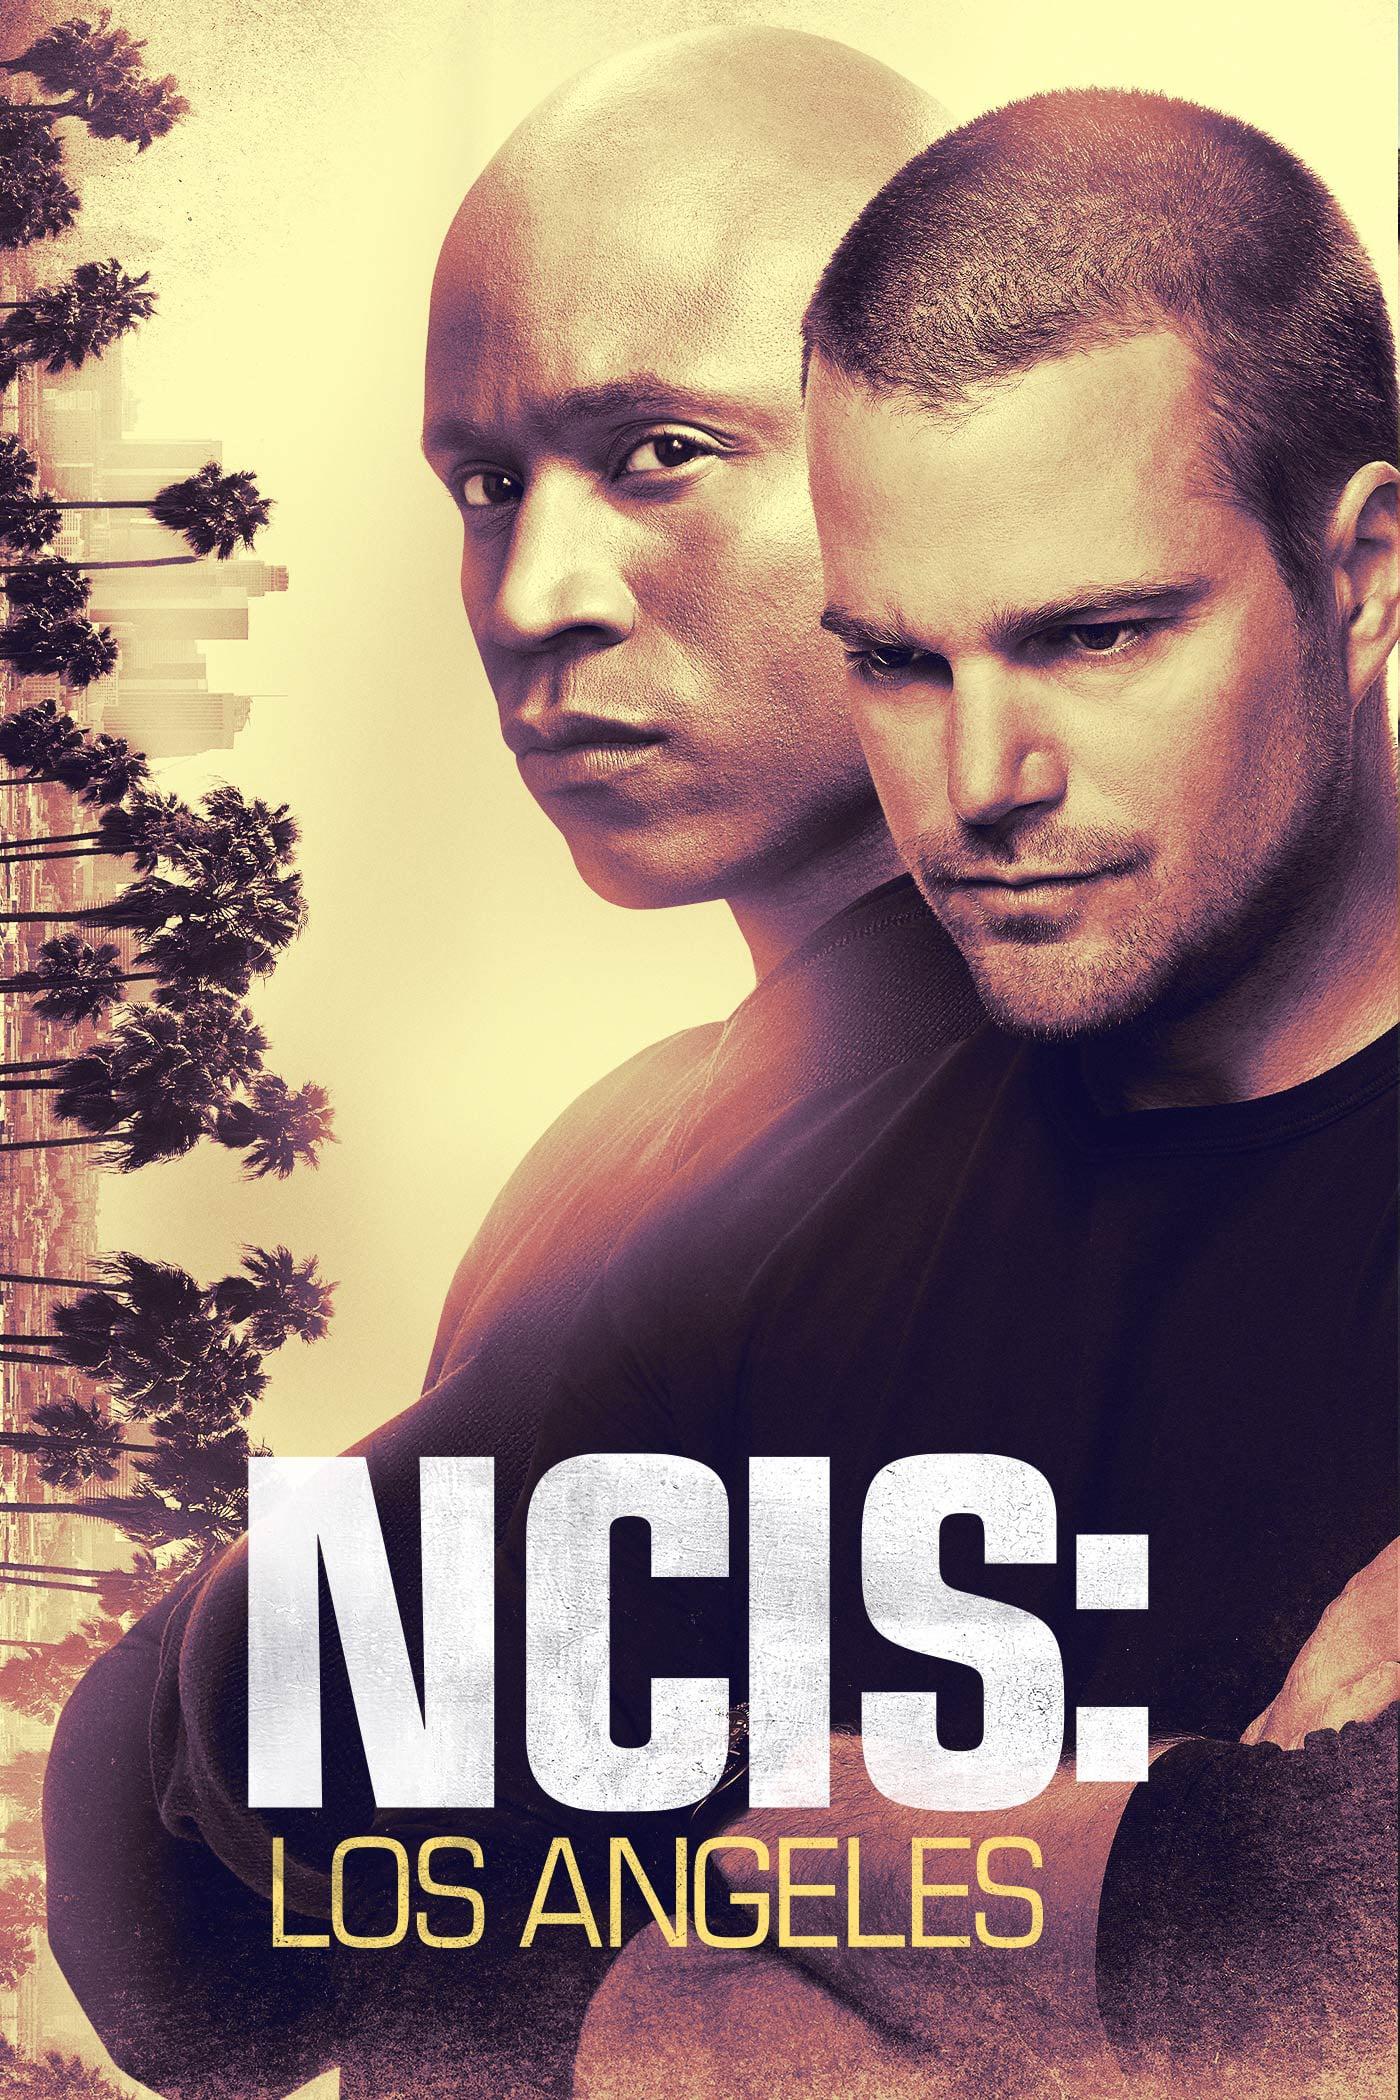 20 - NCIS: Los Angeles